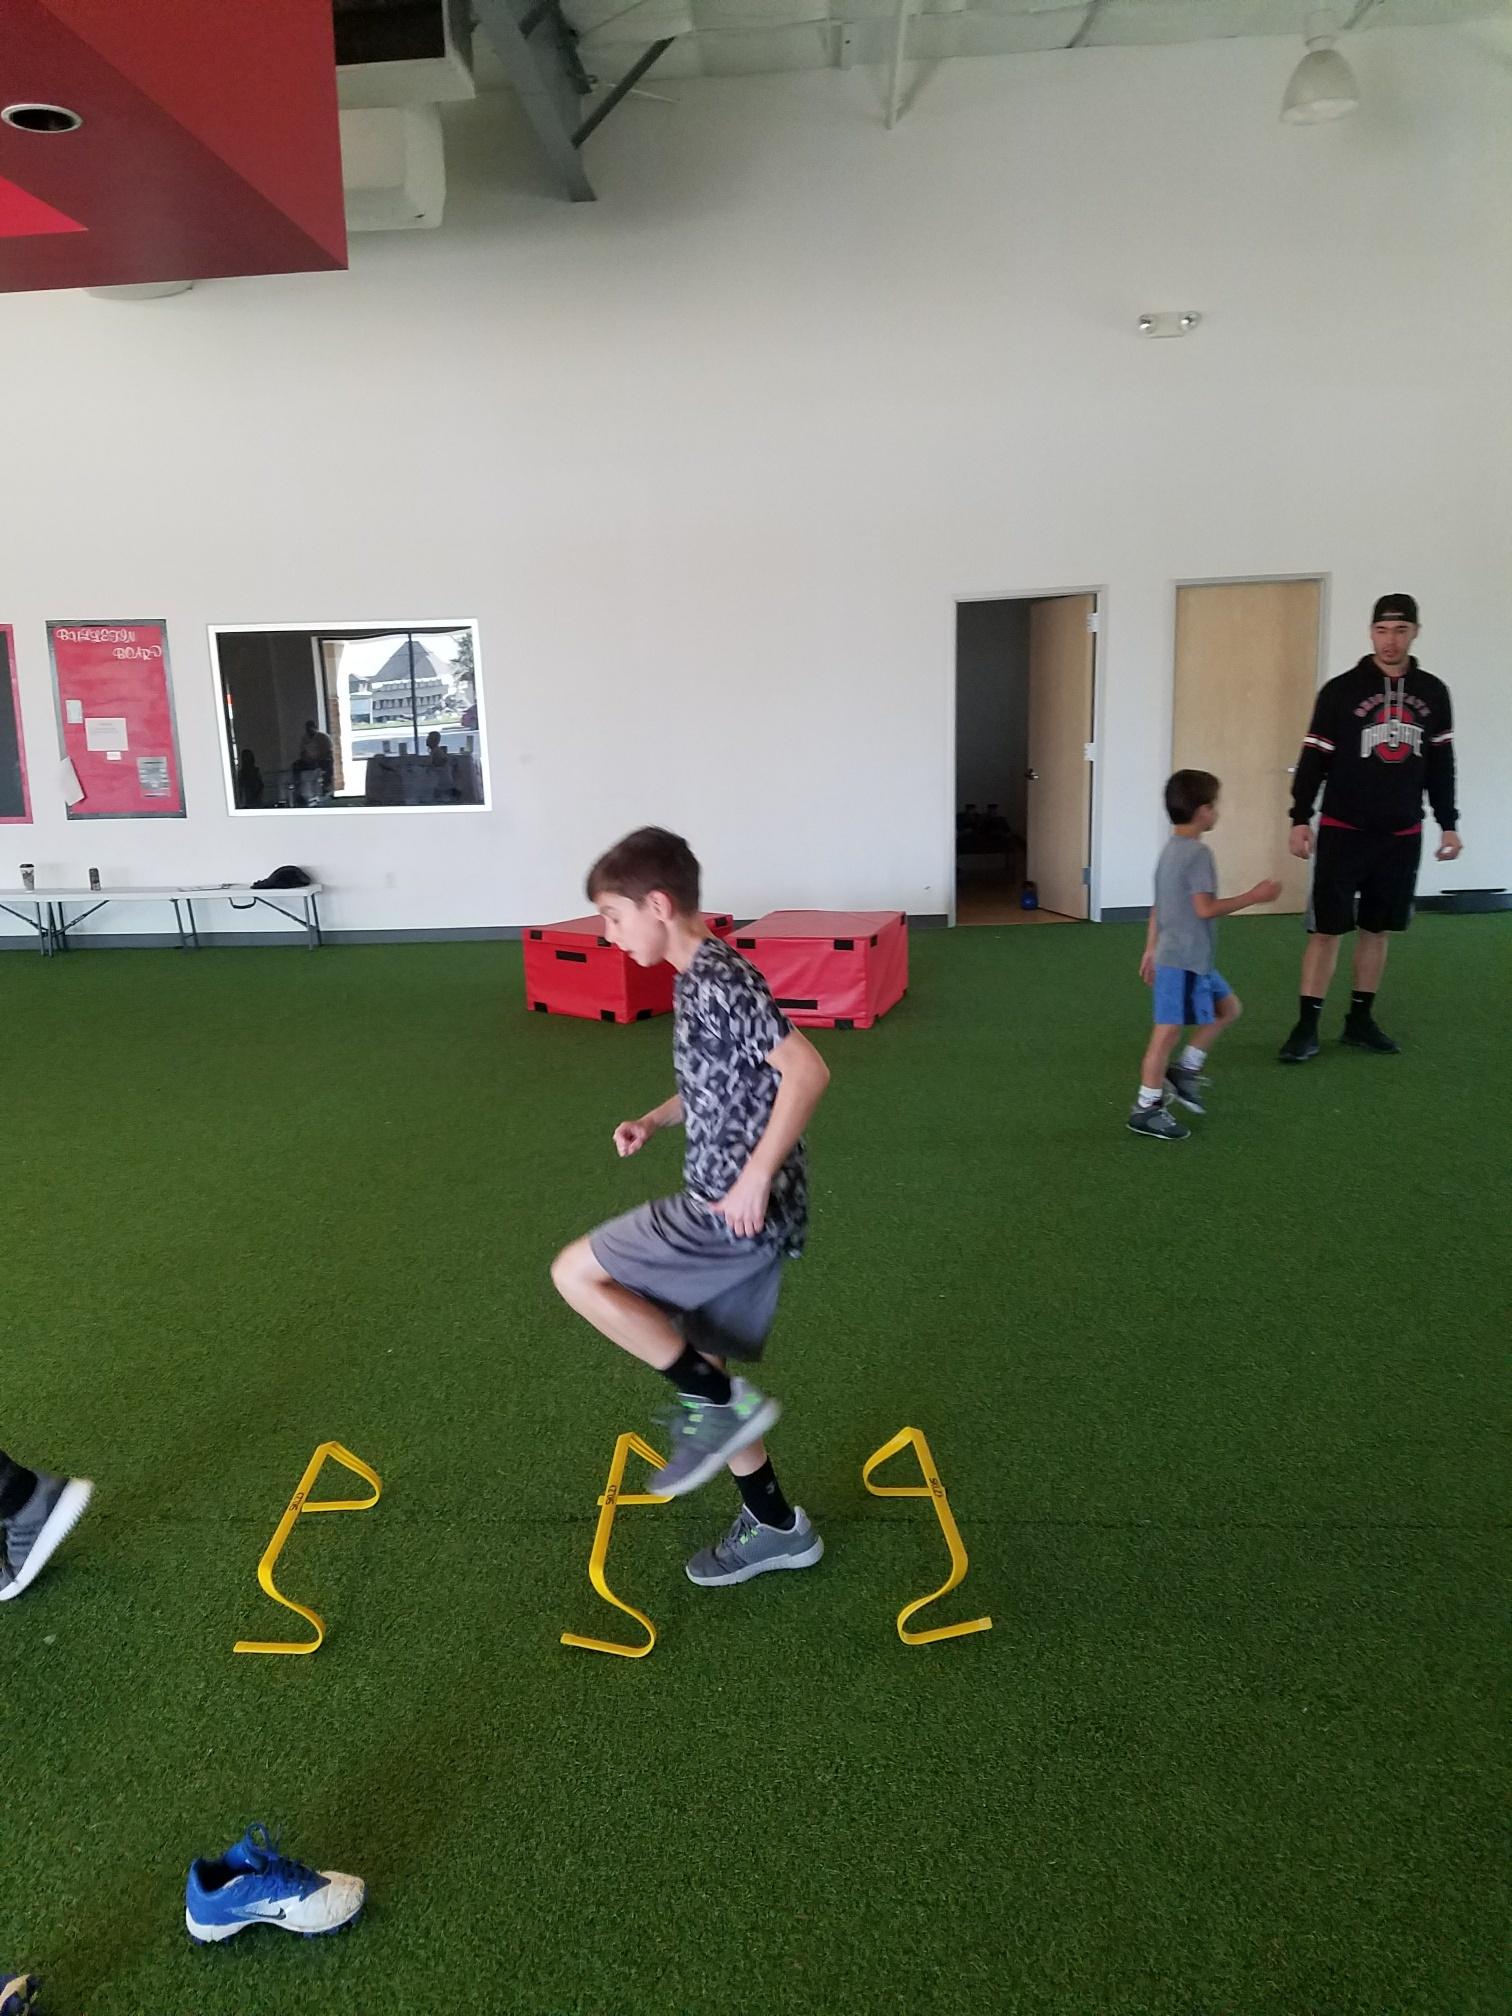 Circuit Training. Utilizing the speed hurdles in this picture!